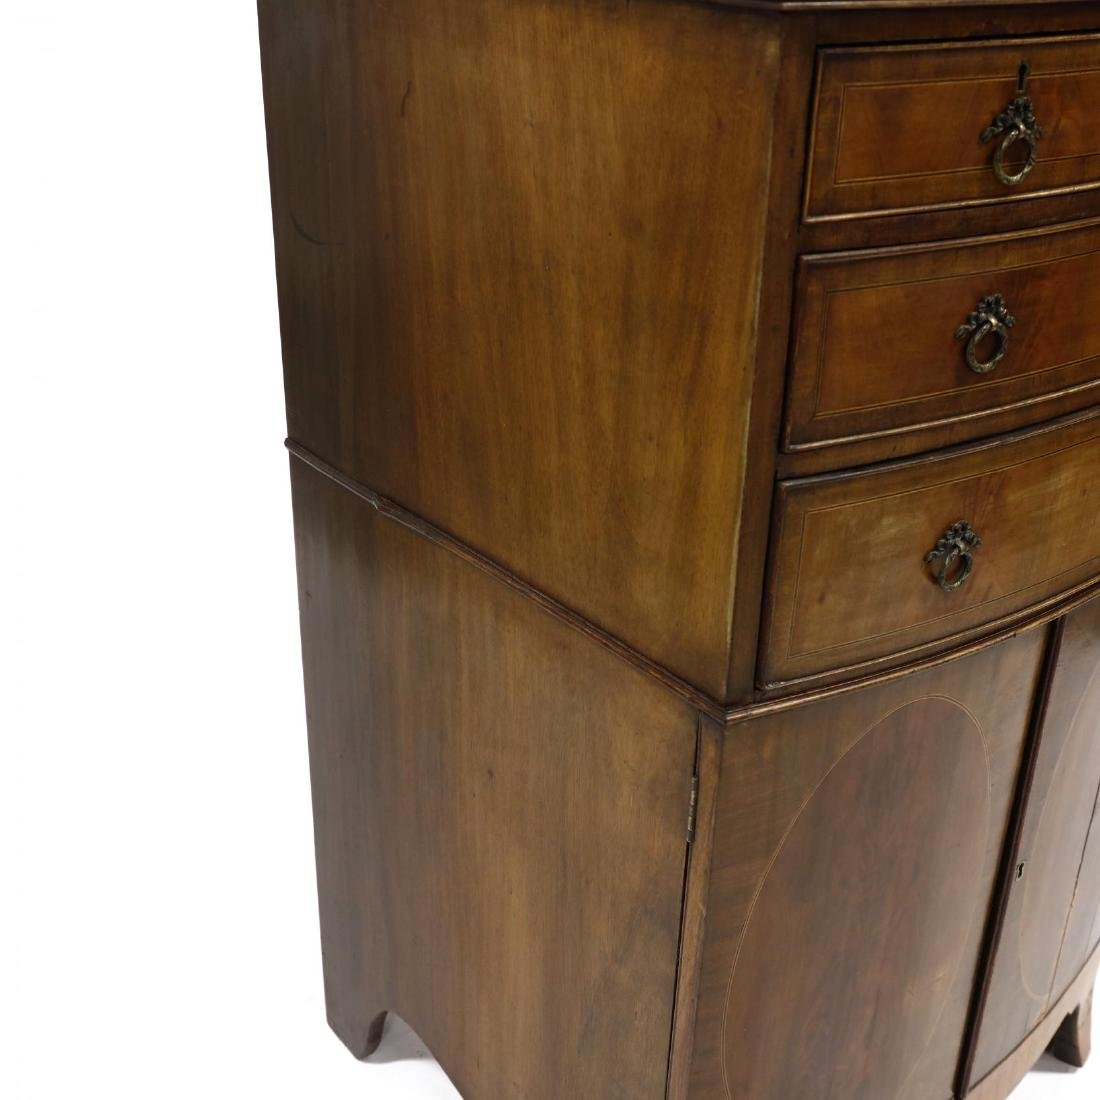 George III Mahogany Inlaid Dressing Cabinet - 3